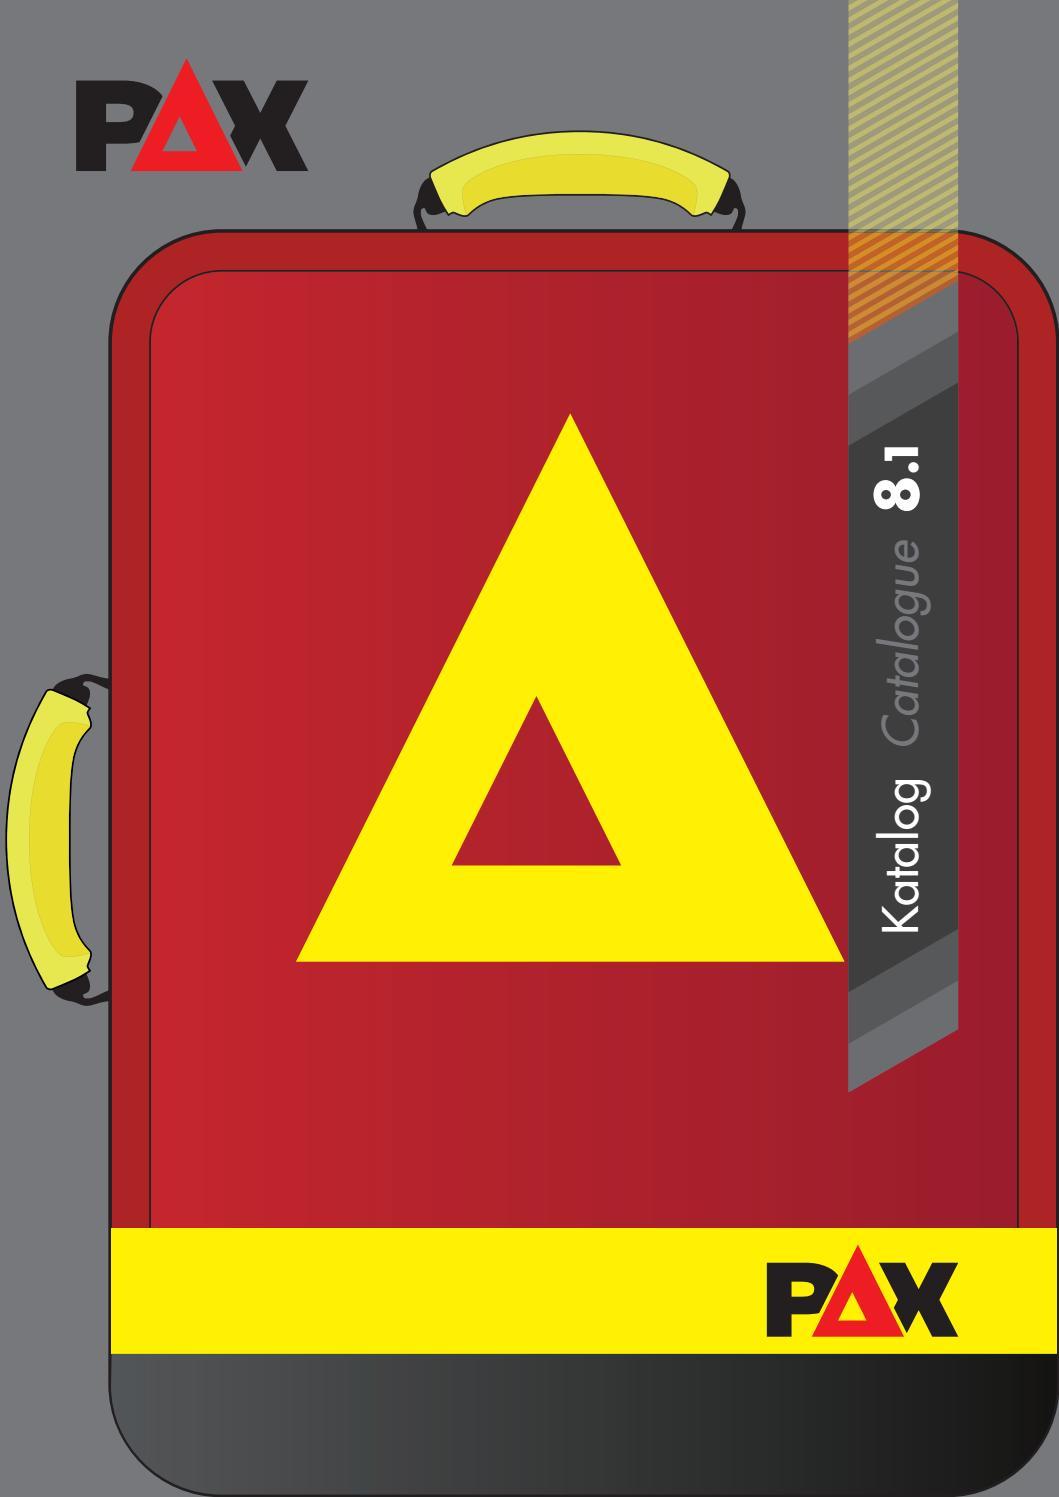 Pax catalog 8 1 complete 1115 pdf by Anders Haug Thomassen - issuu